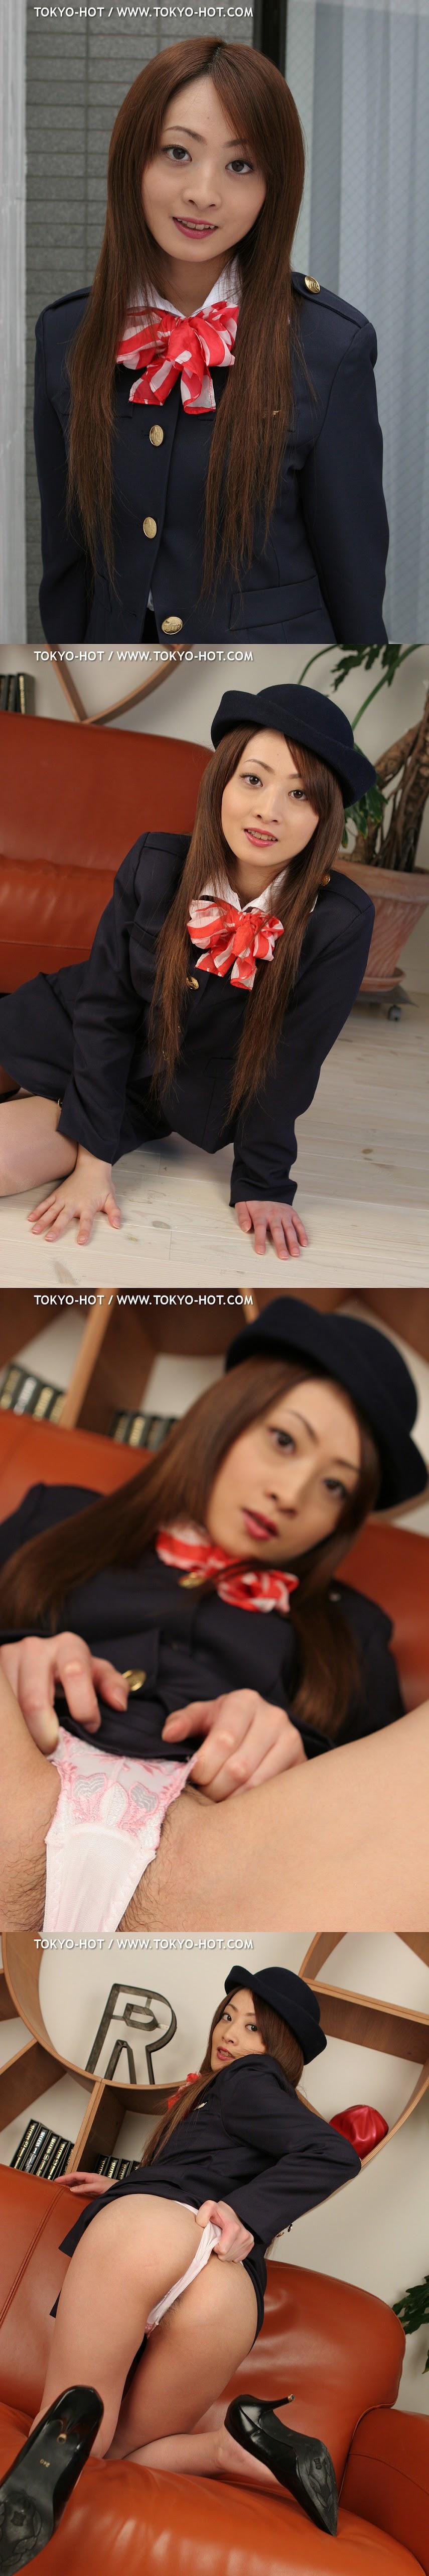 Tokyo-Hot e023 reika ayanami 003